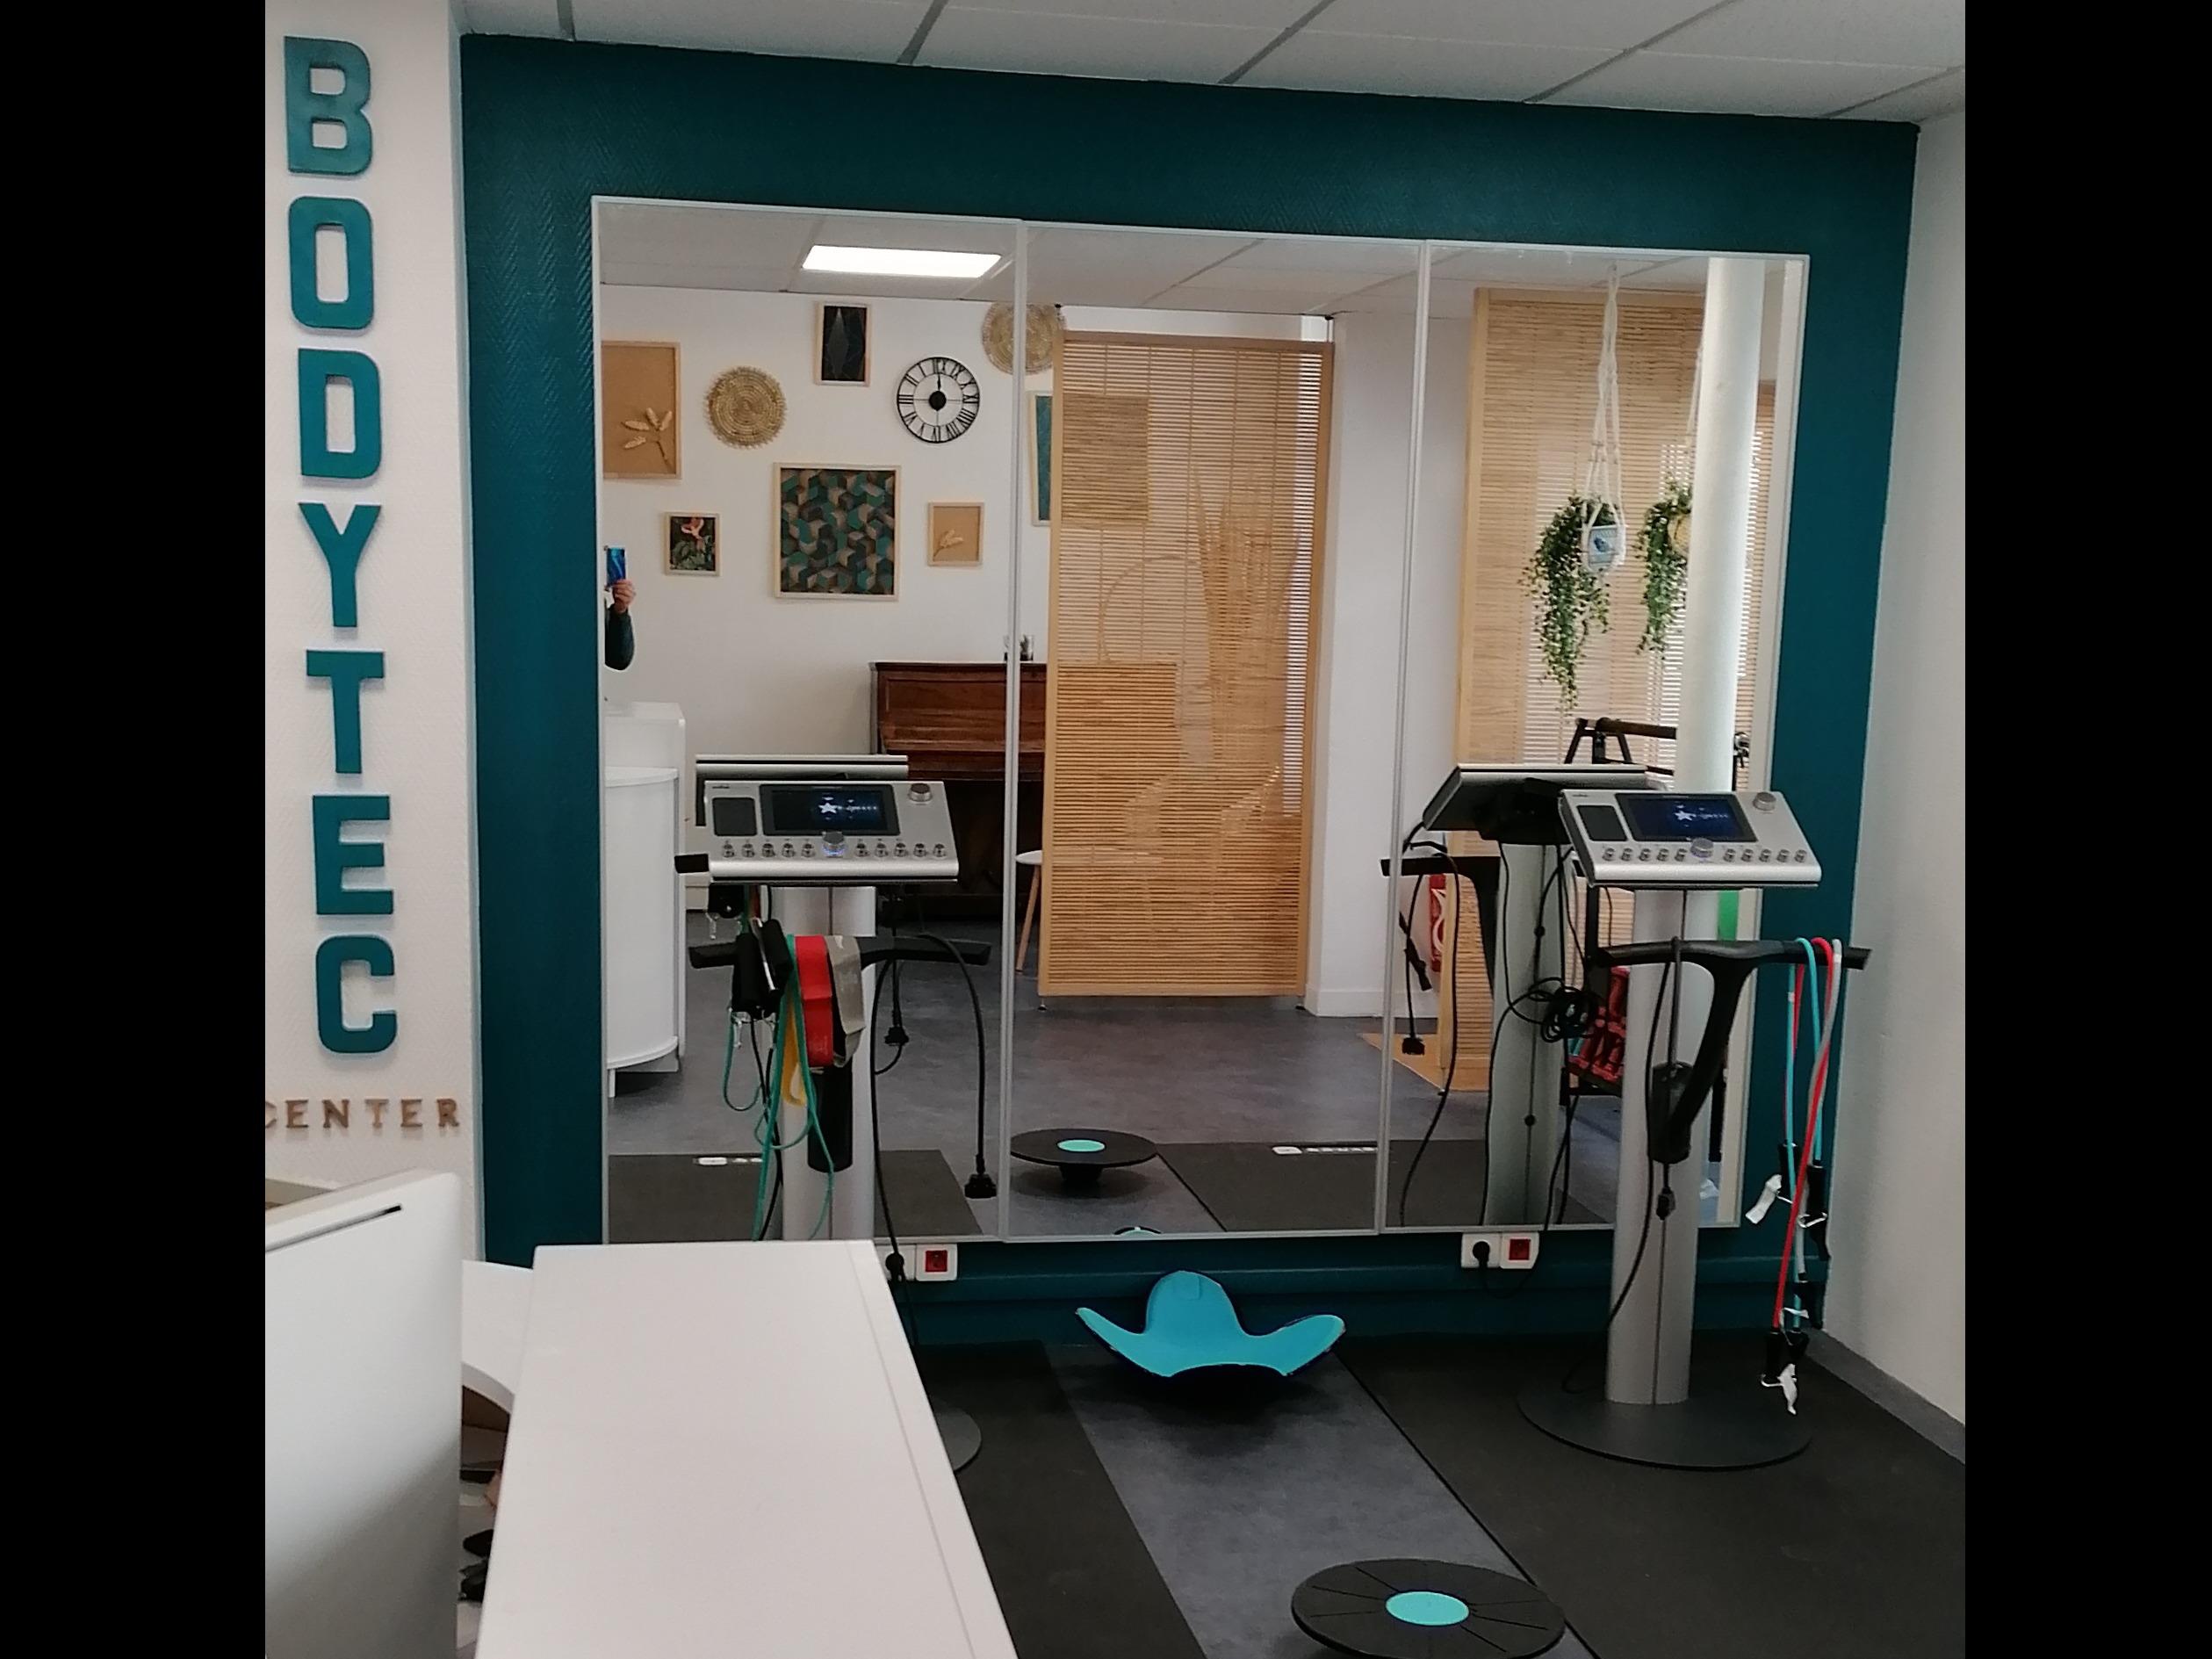 Bodytechcenter paris 15 Beaugrenelle - Electrostimulation